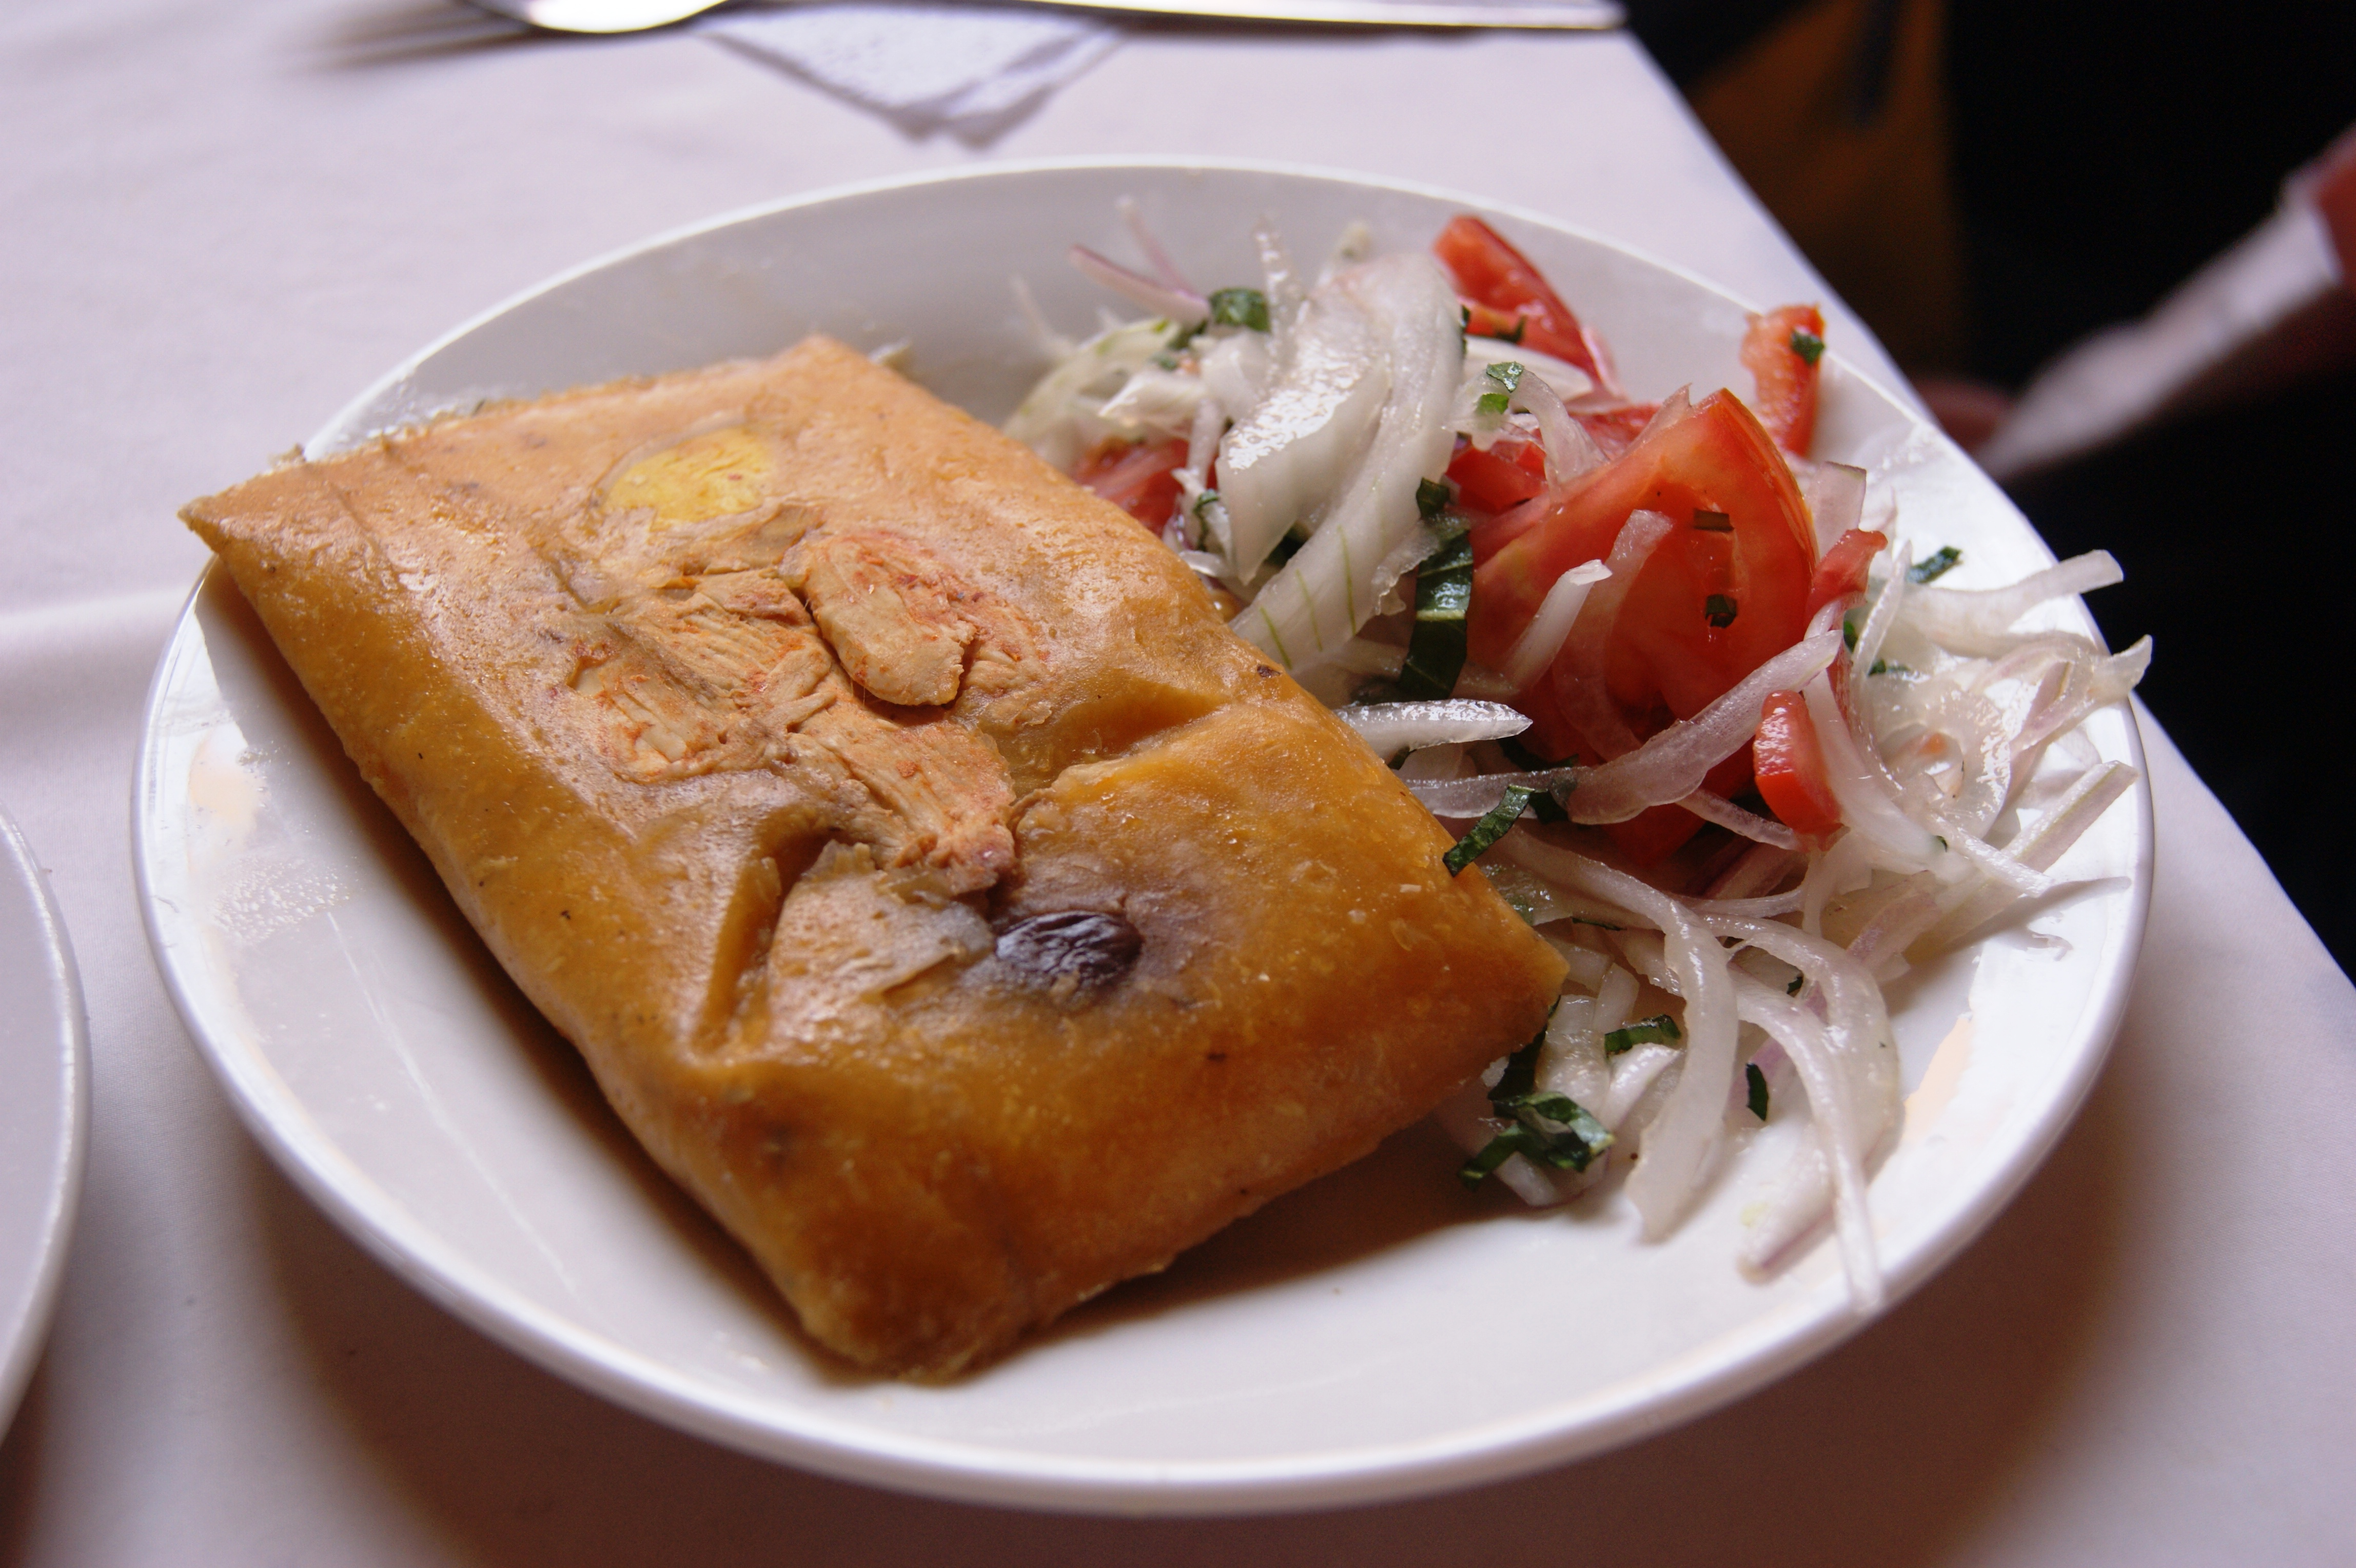 File:Tamal con salsa criolla 2 31072010.jpg - Wikimedia ...